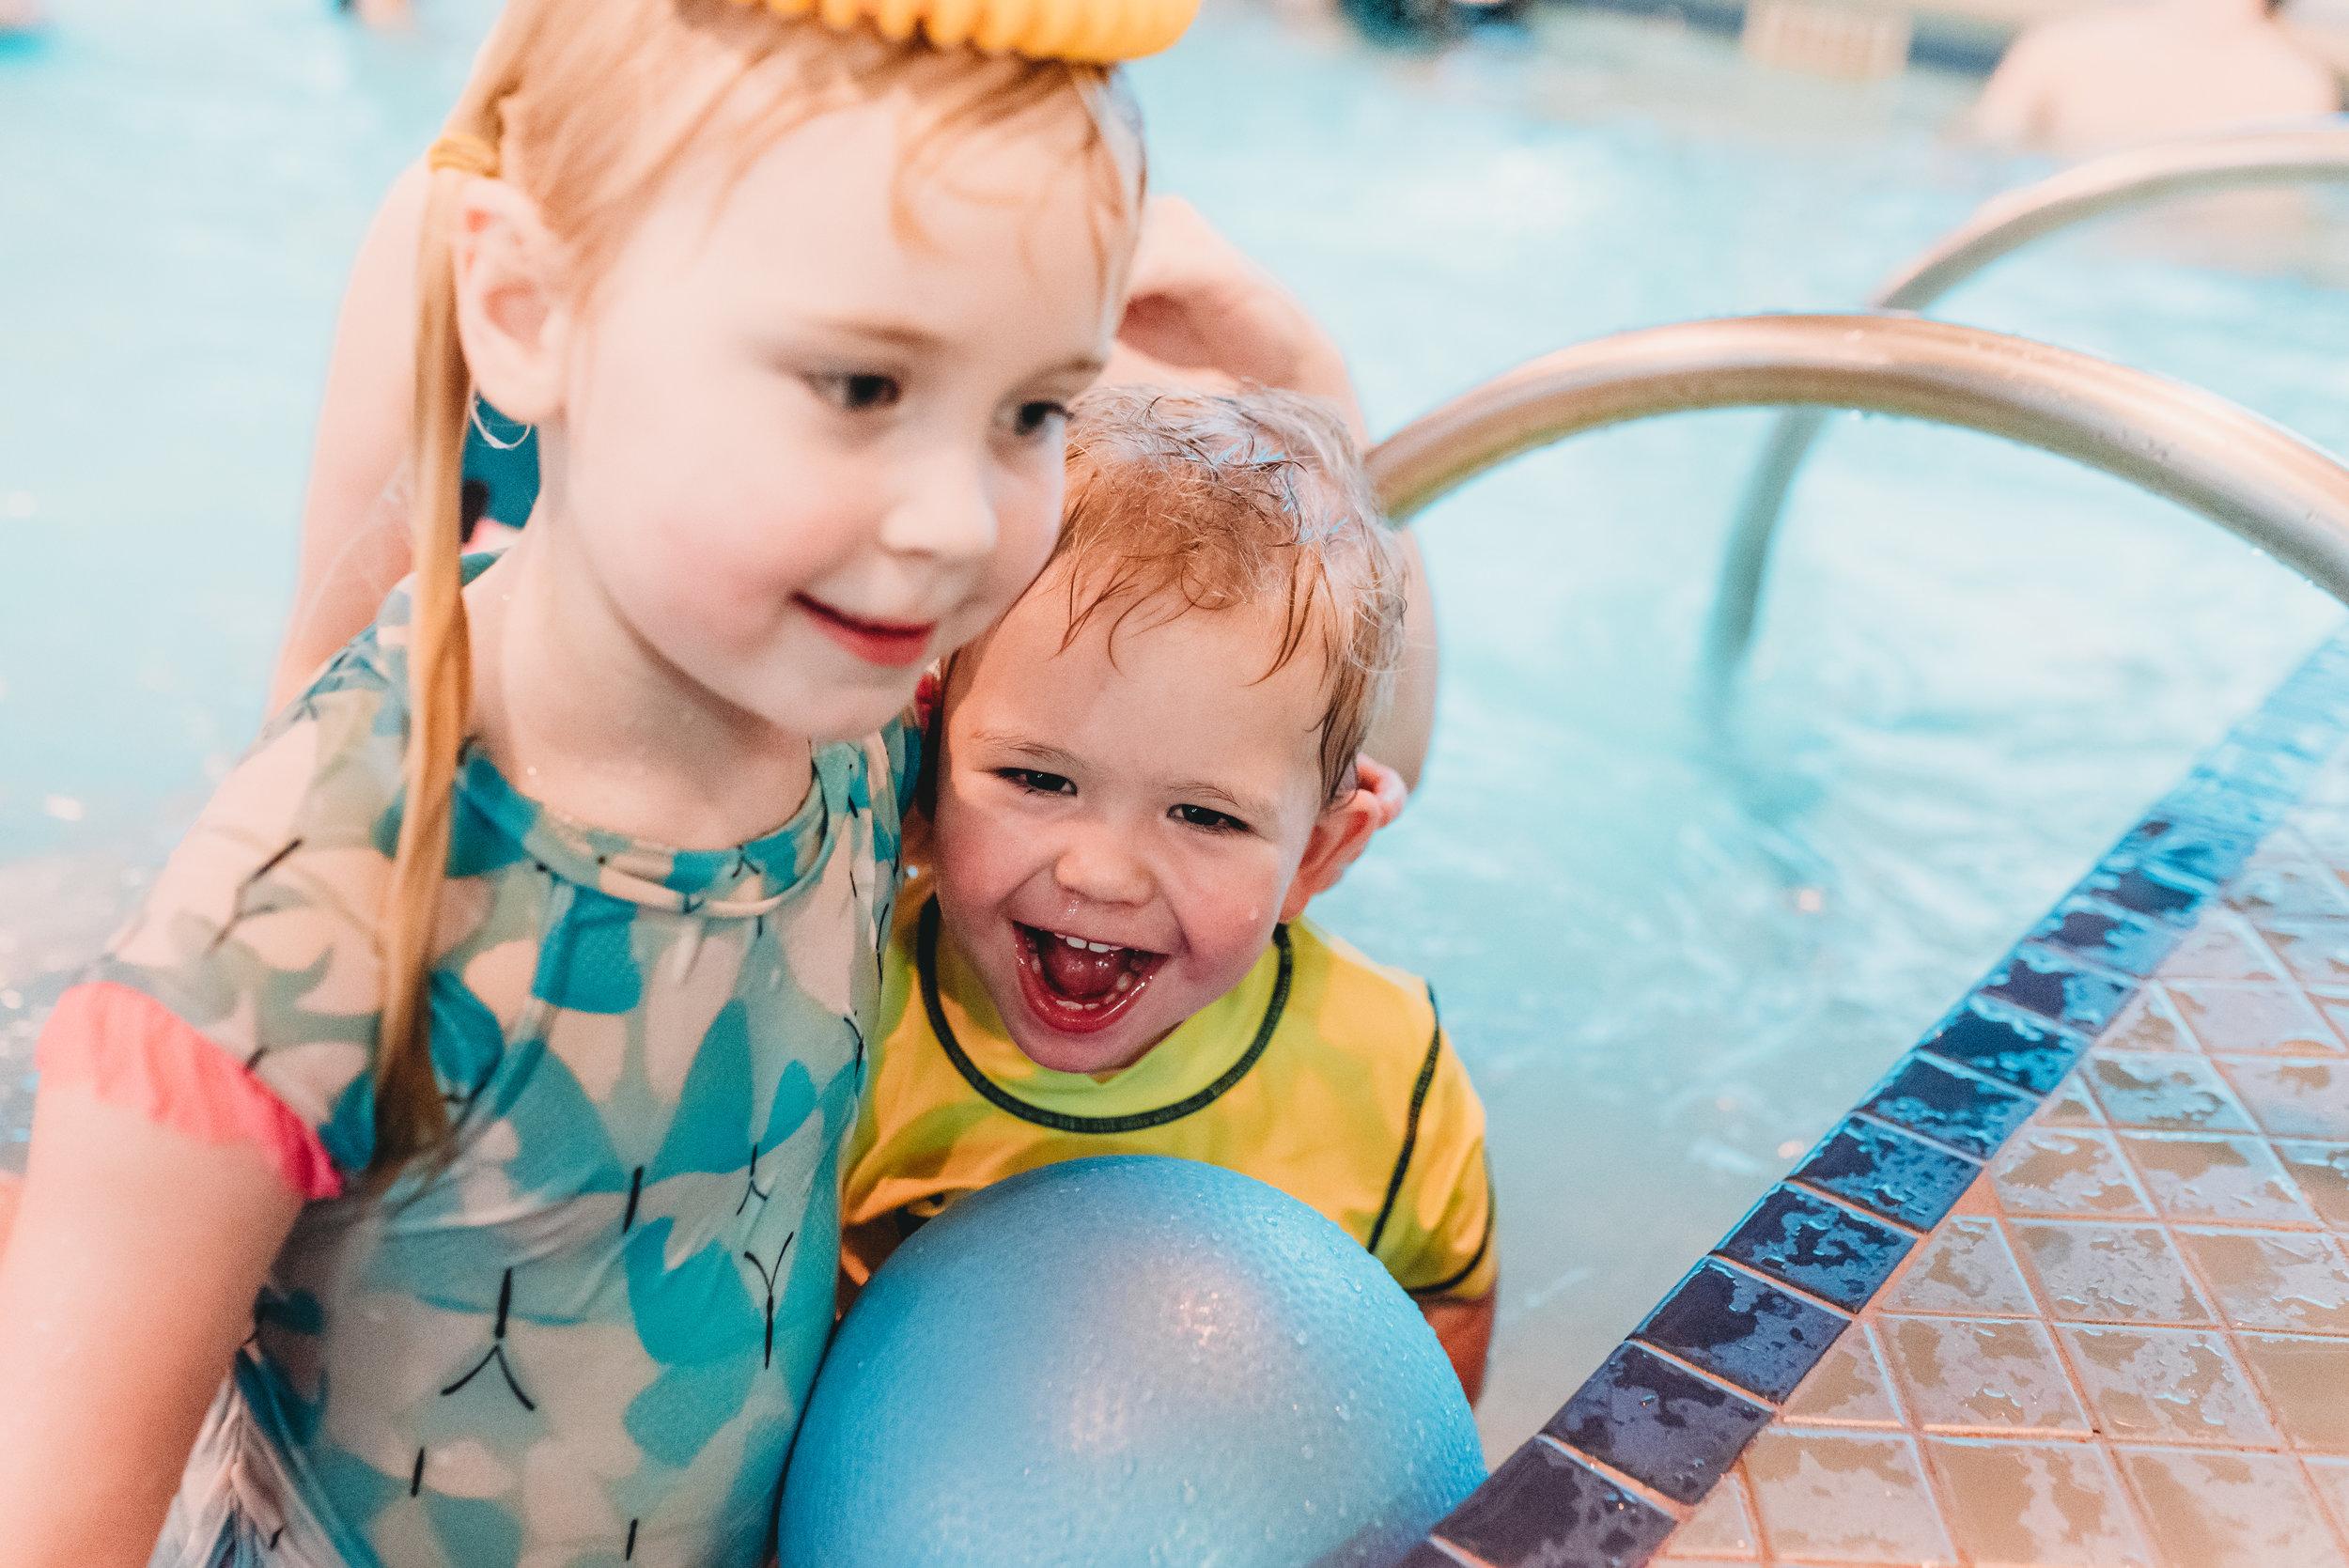 Nicola_Reiersen_Photography_Kids_Birthday_Pool_Party (20).jpg